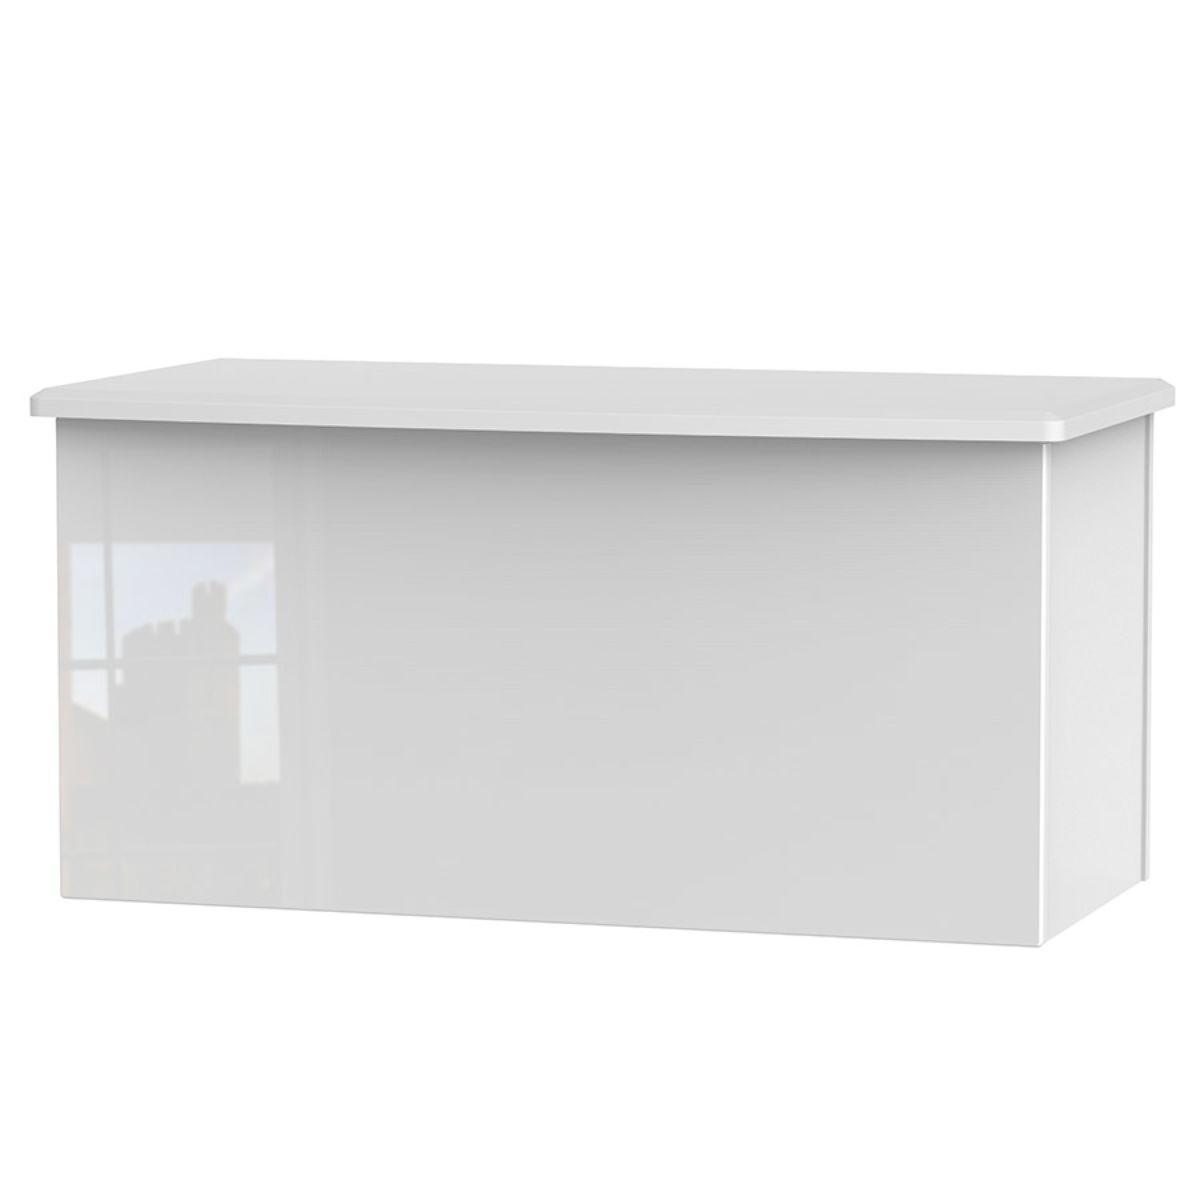 Fourisse Blanket Box - White